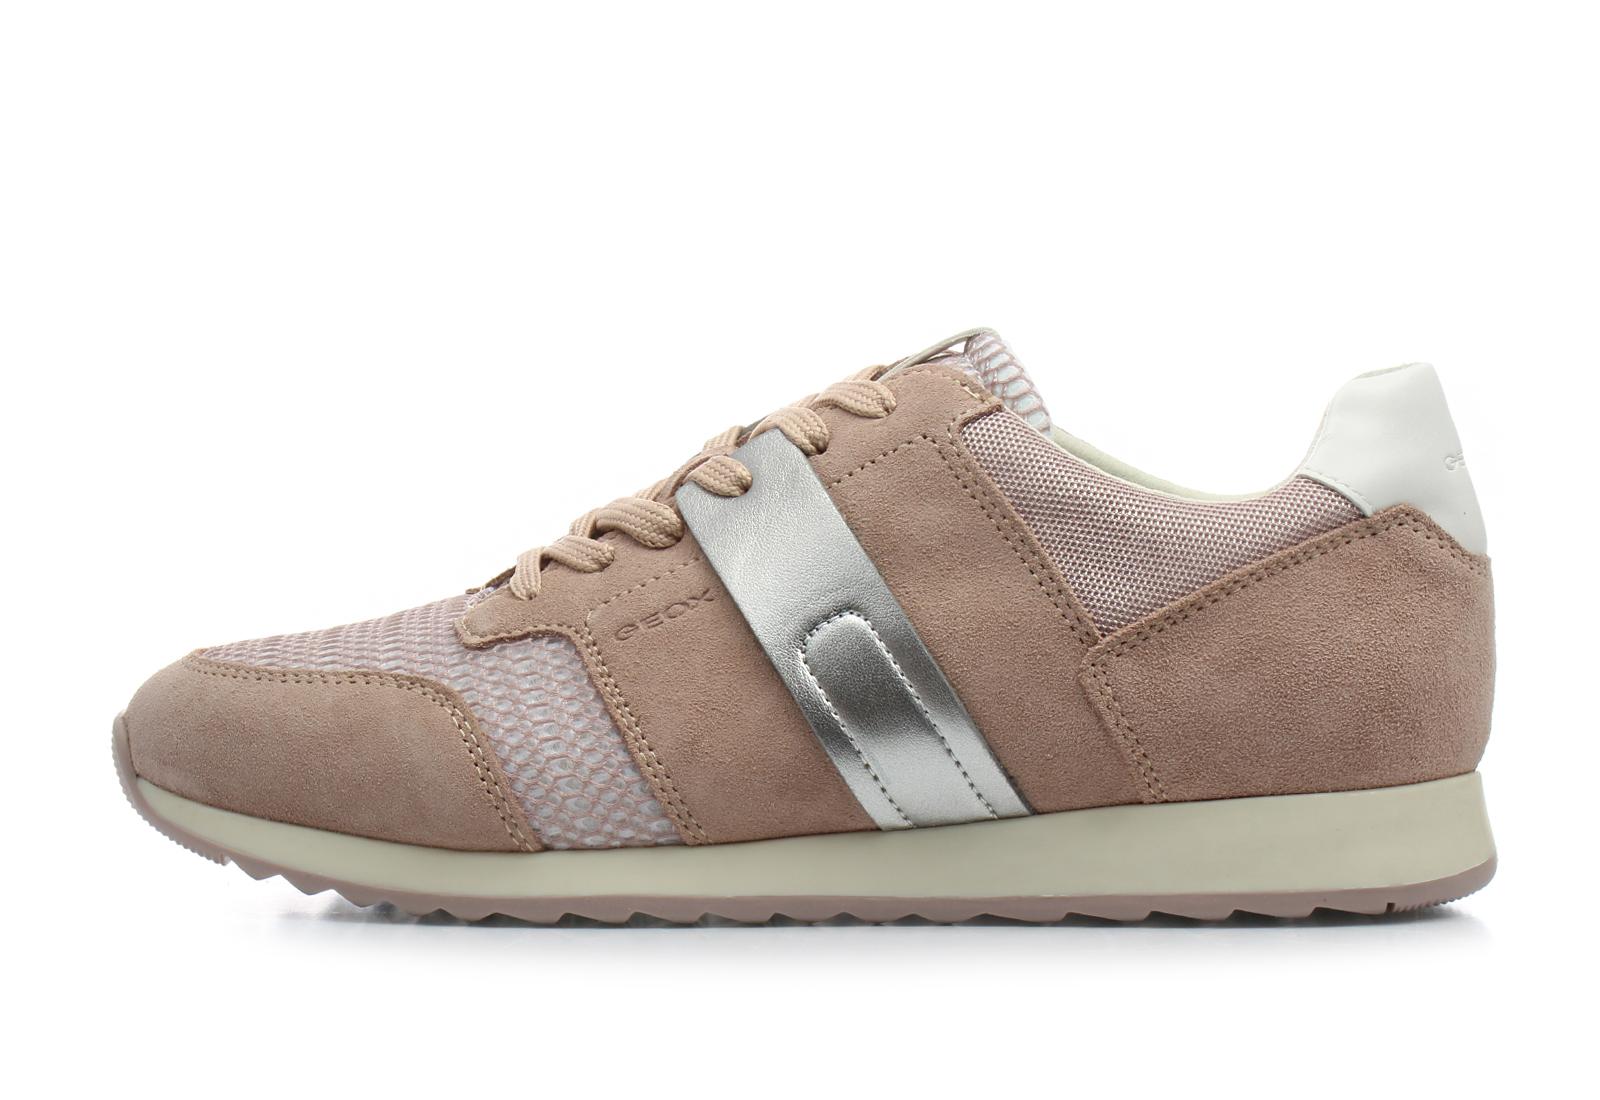 Geox Shoes Deynna D02 214c 8056 Online Shop For